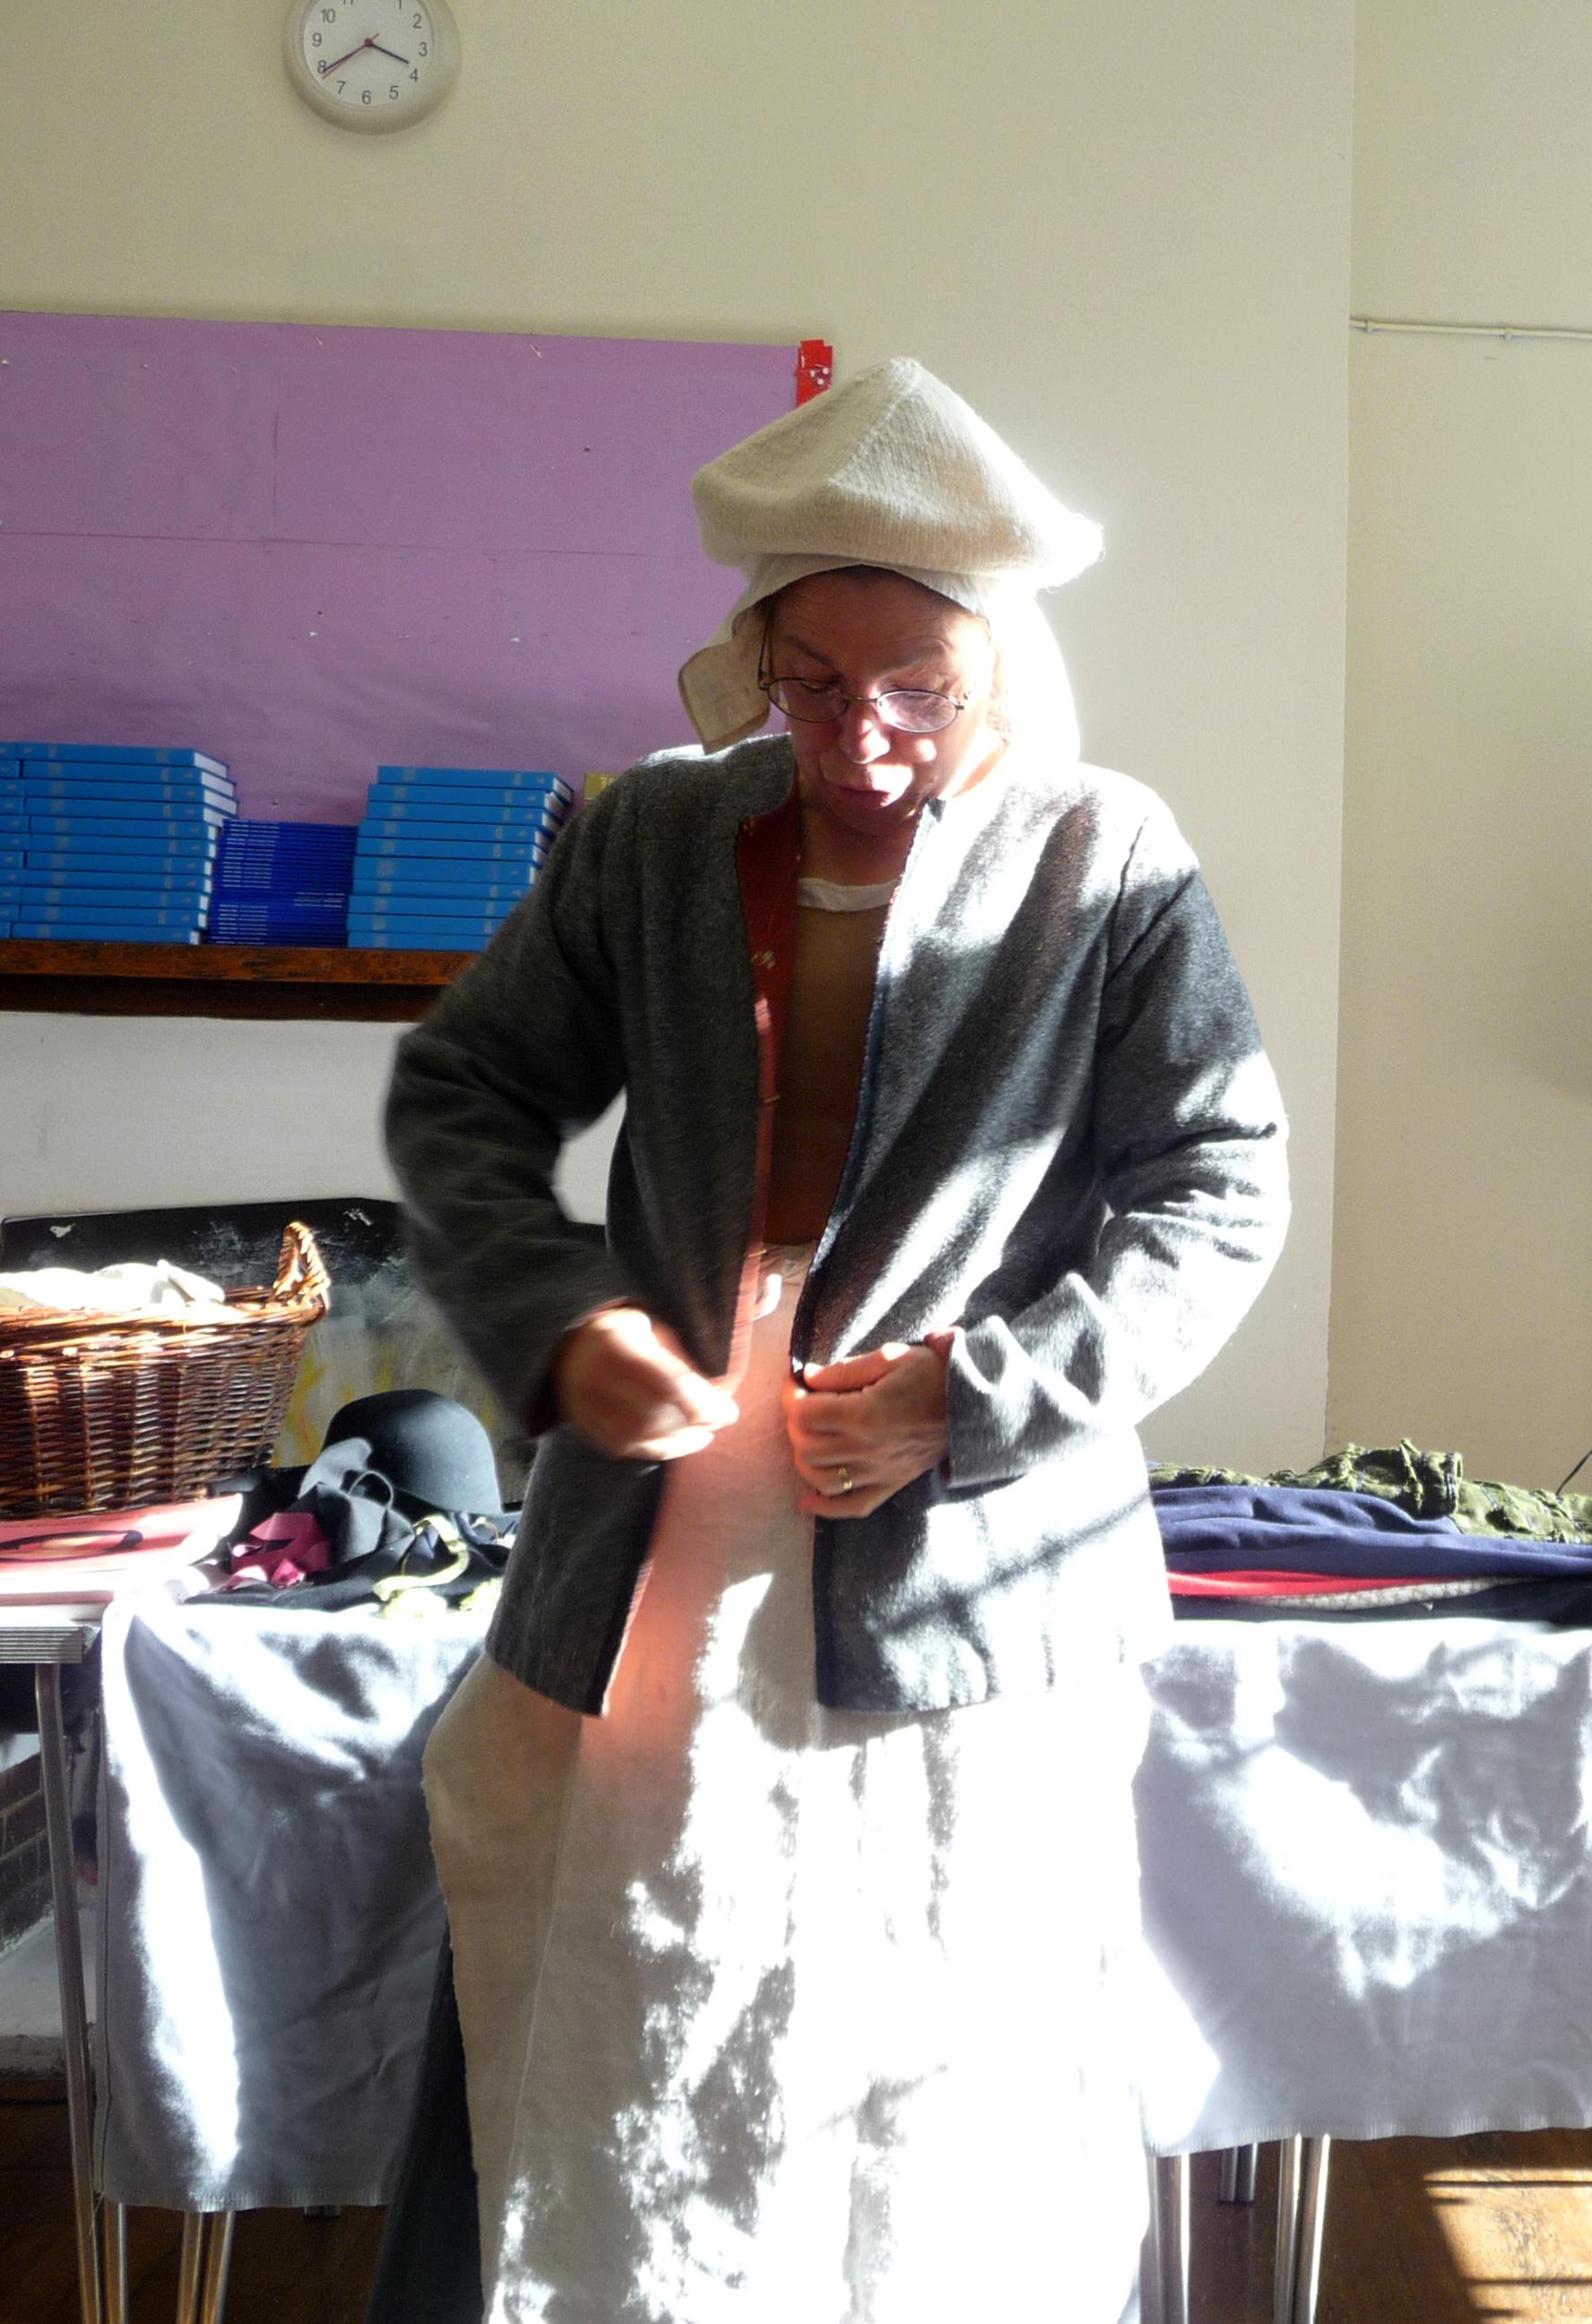 Tudor scummy waistcoat, woolen cap and coif